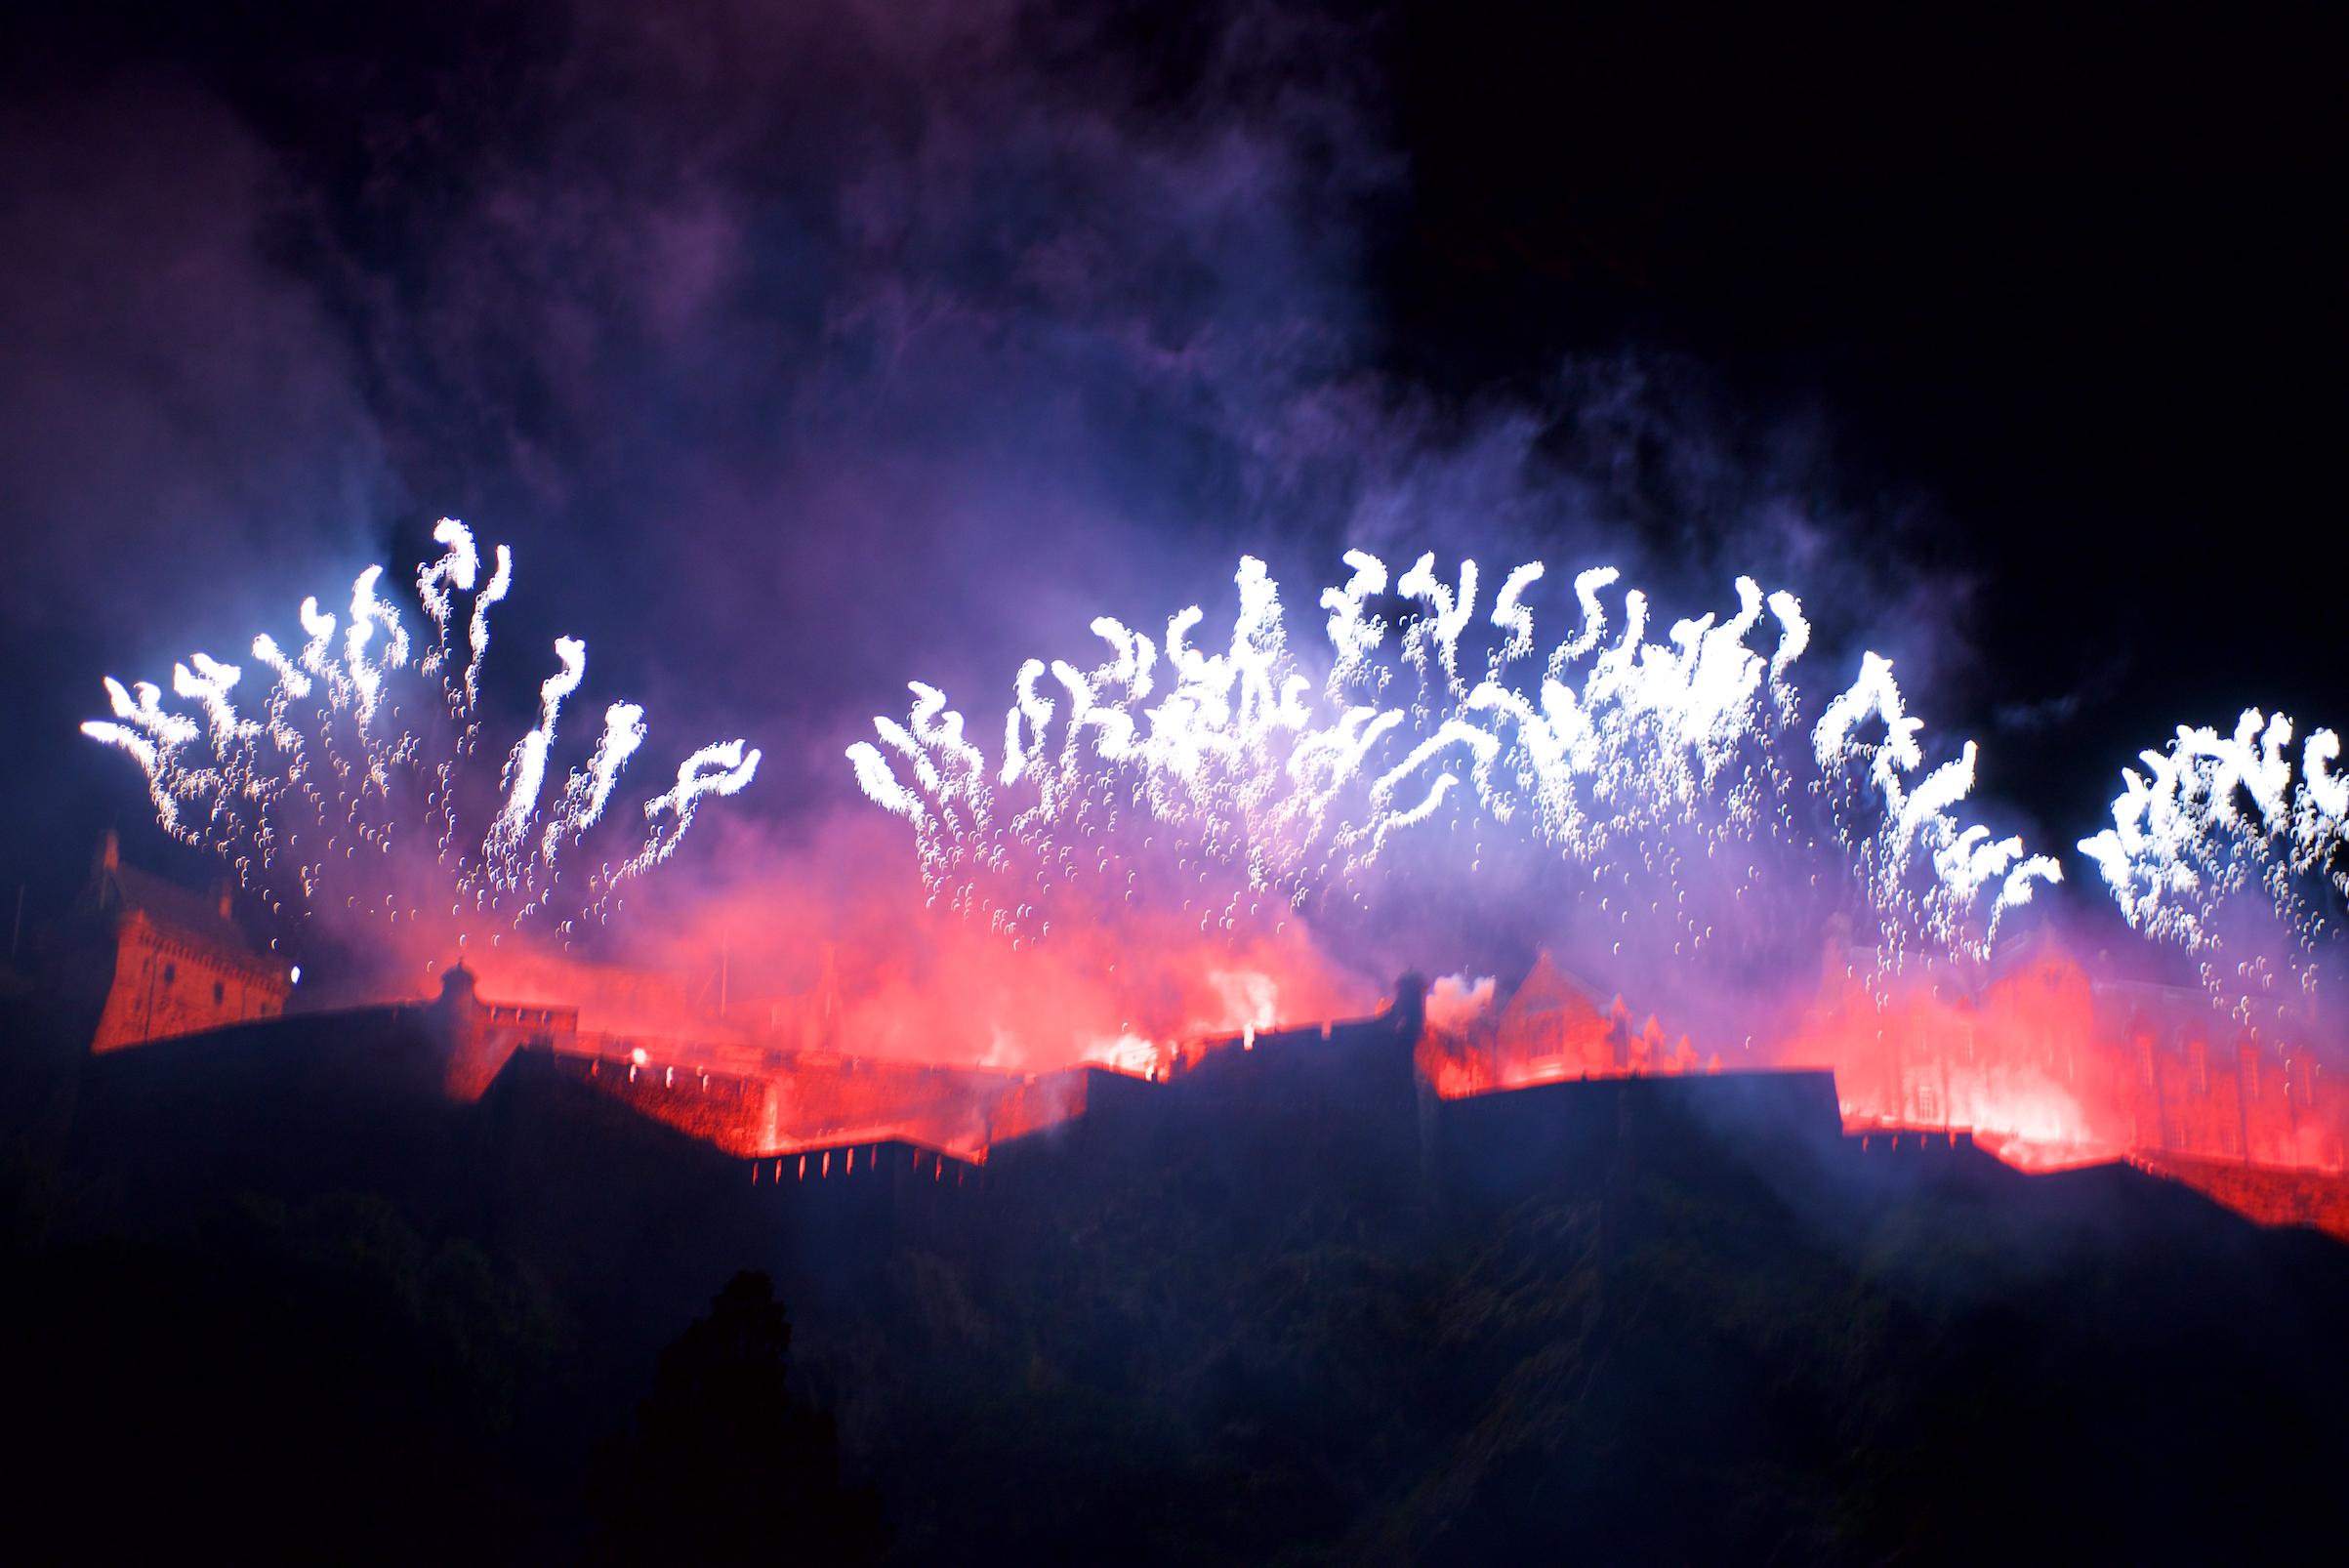 grand-finale-of-the-2017-international-festival-virgin-money-fireworks-concert-ross-bandstand-princes-street-gardens-edinburgh-uk-monday-28th-august-2017-10